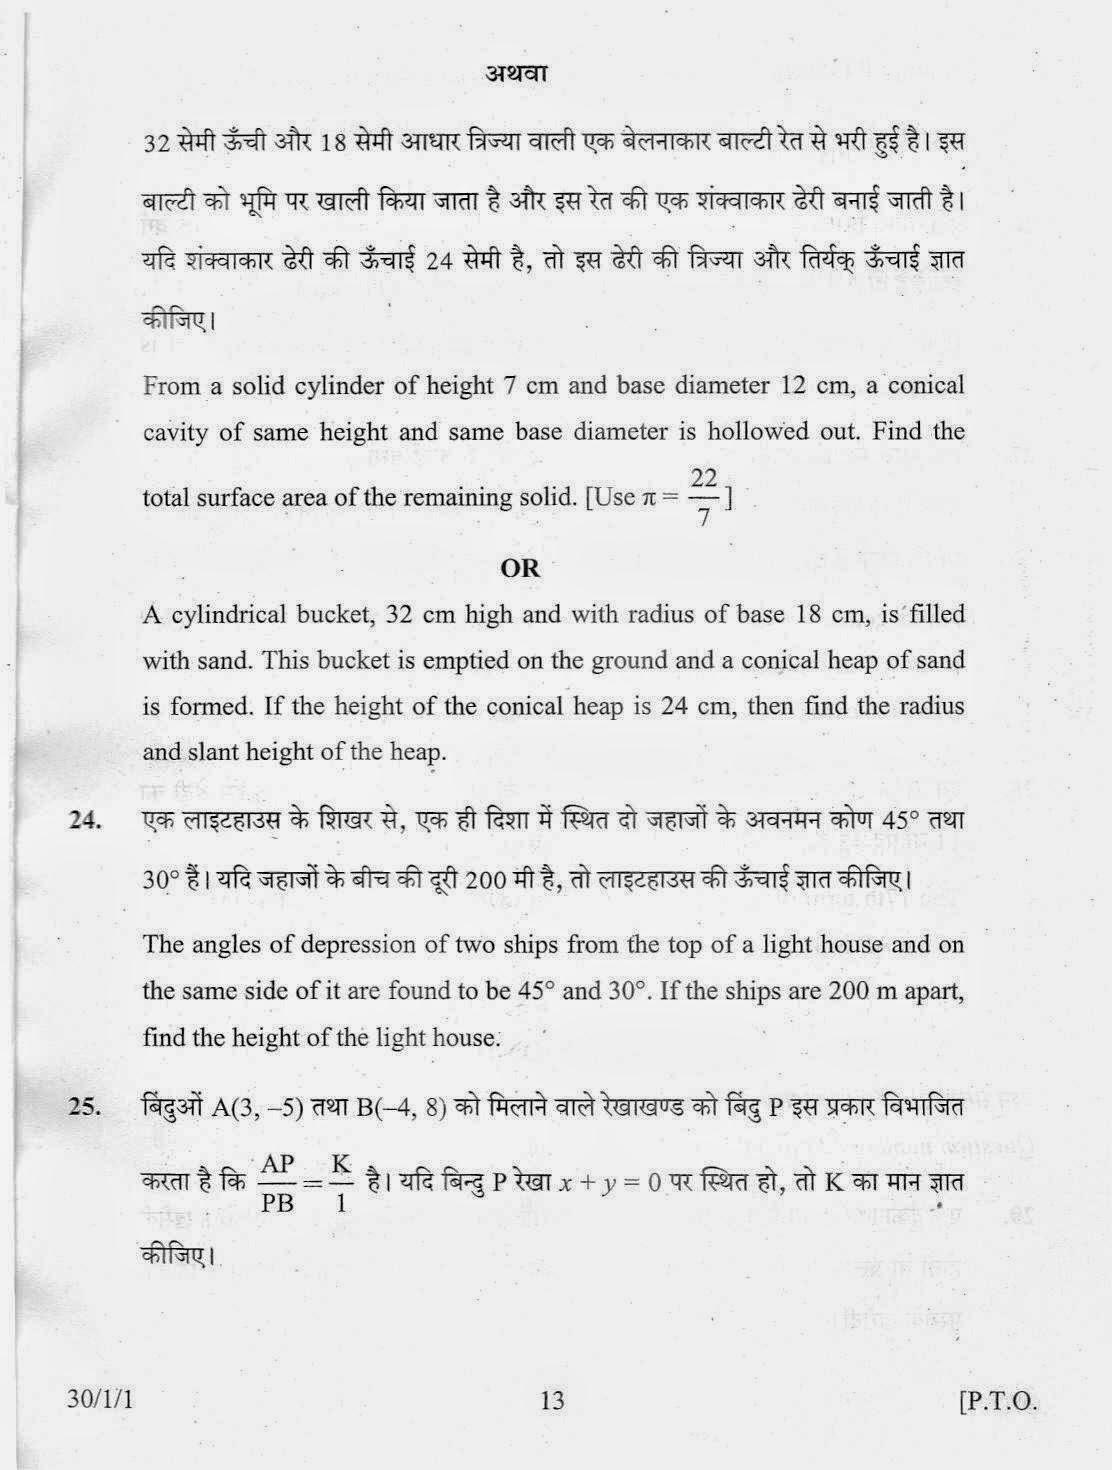 Sample Question Paper For Class 10 Cbse Sa2 Hindi B